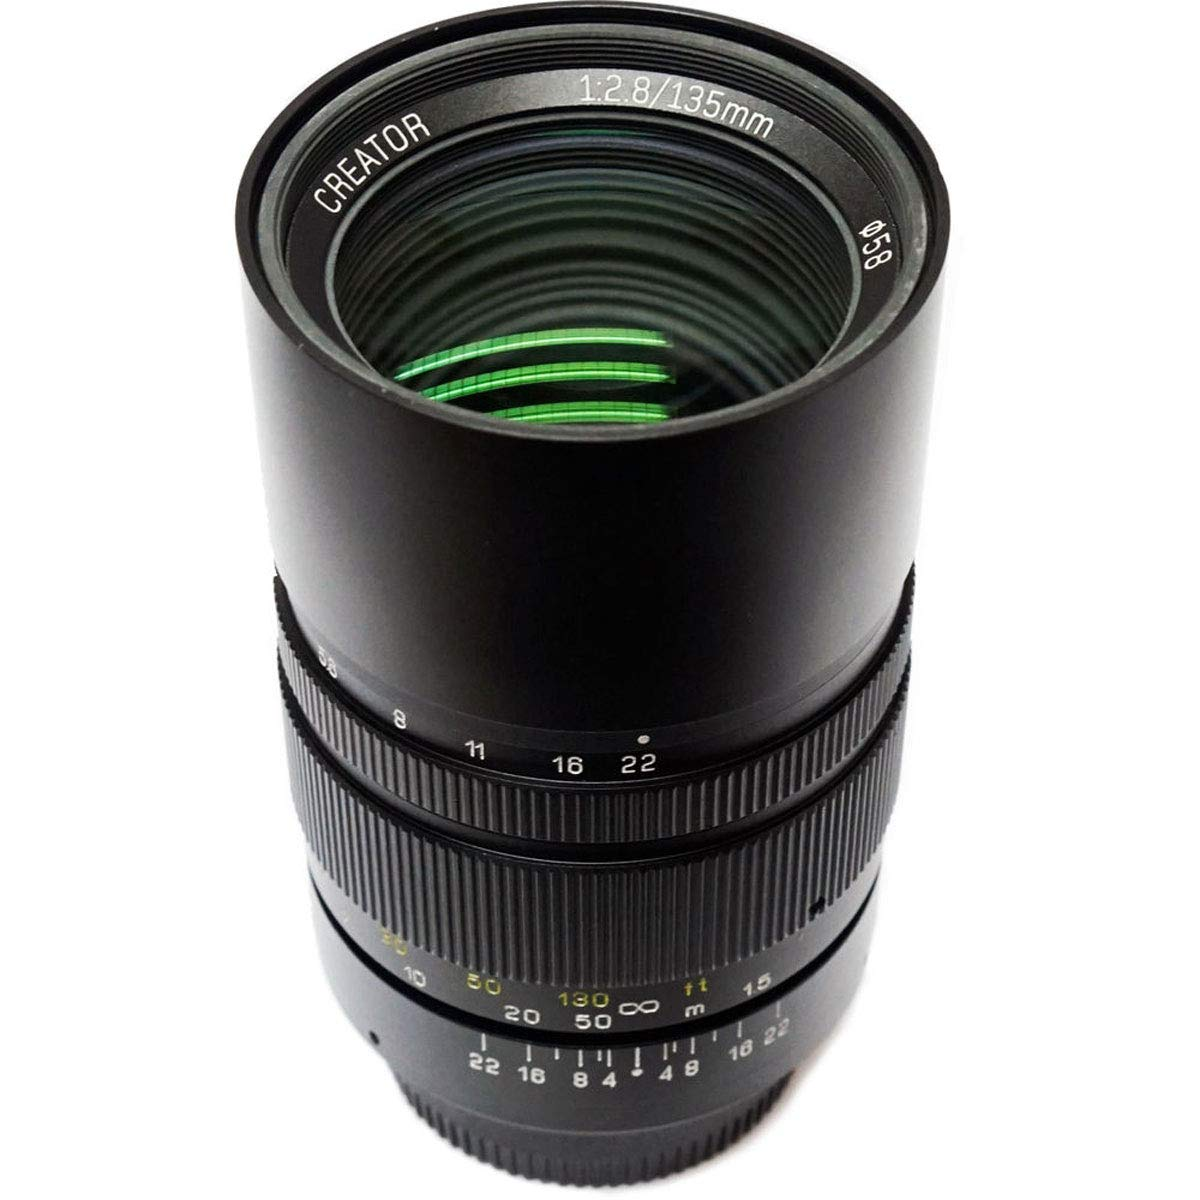 Mitakon Zhongyi Creator 135mm f/2.8 フルフレーム プライムバージョンII レンズ Canon EFマウントカメラ用   B07K6BYBYR